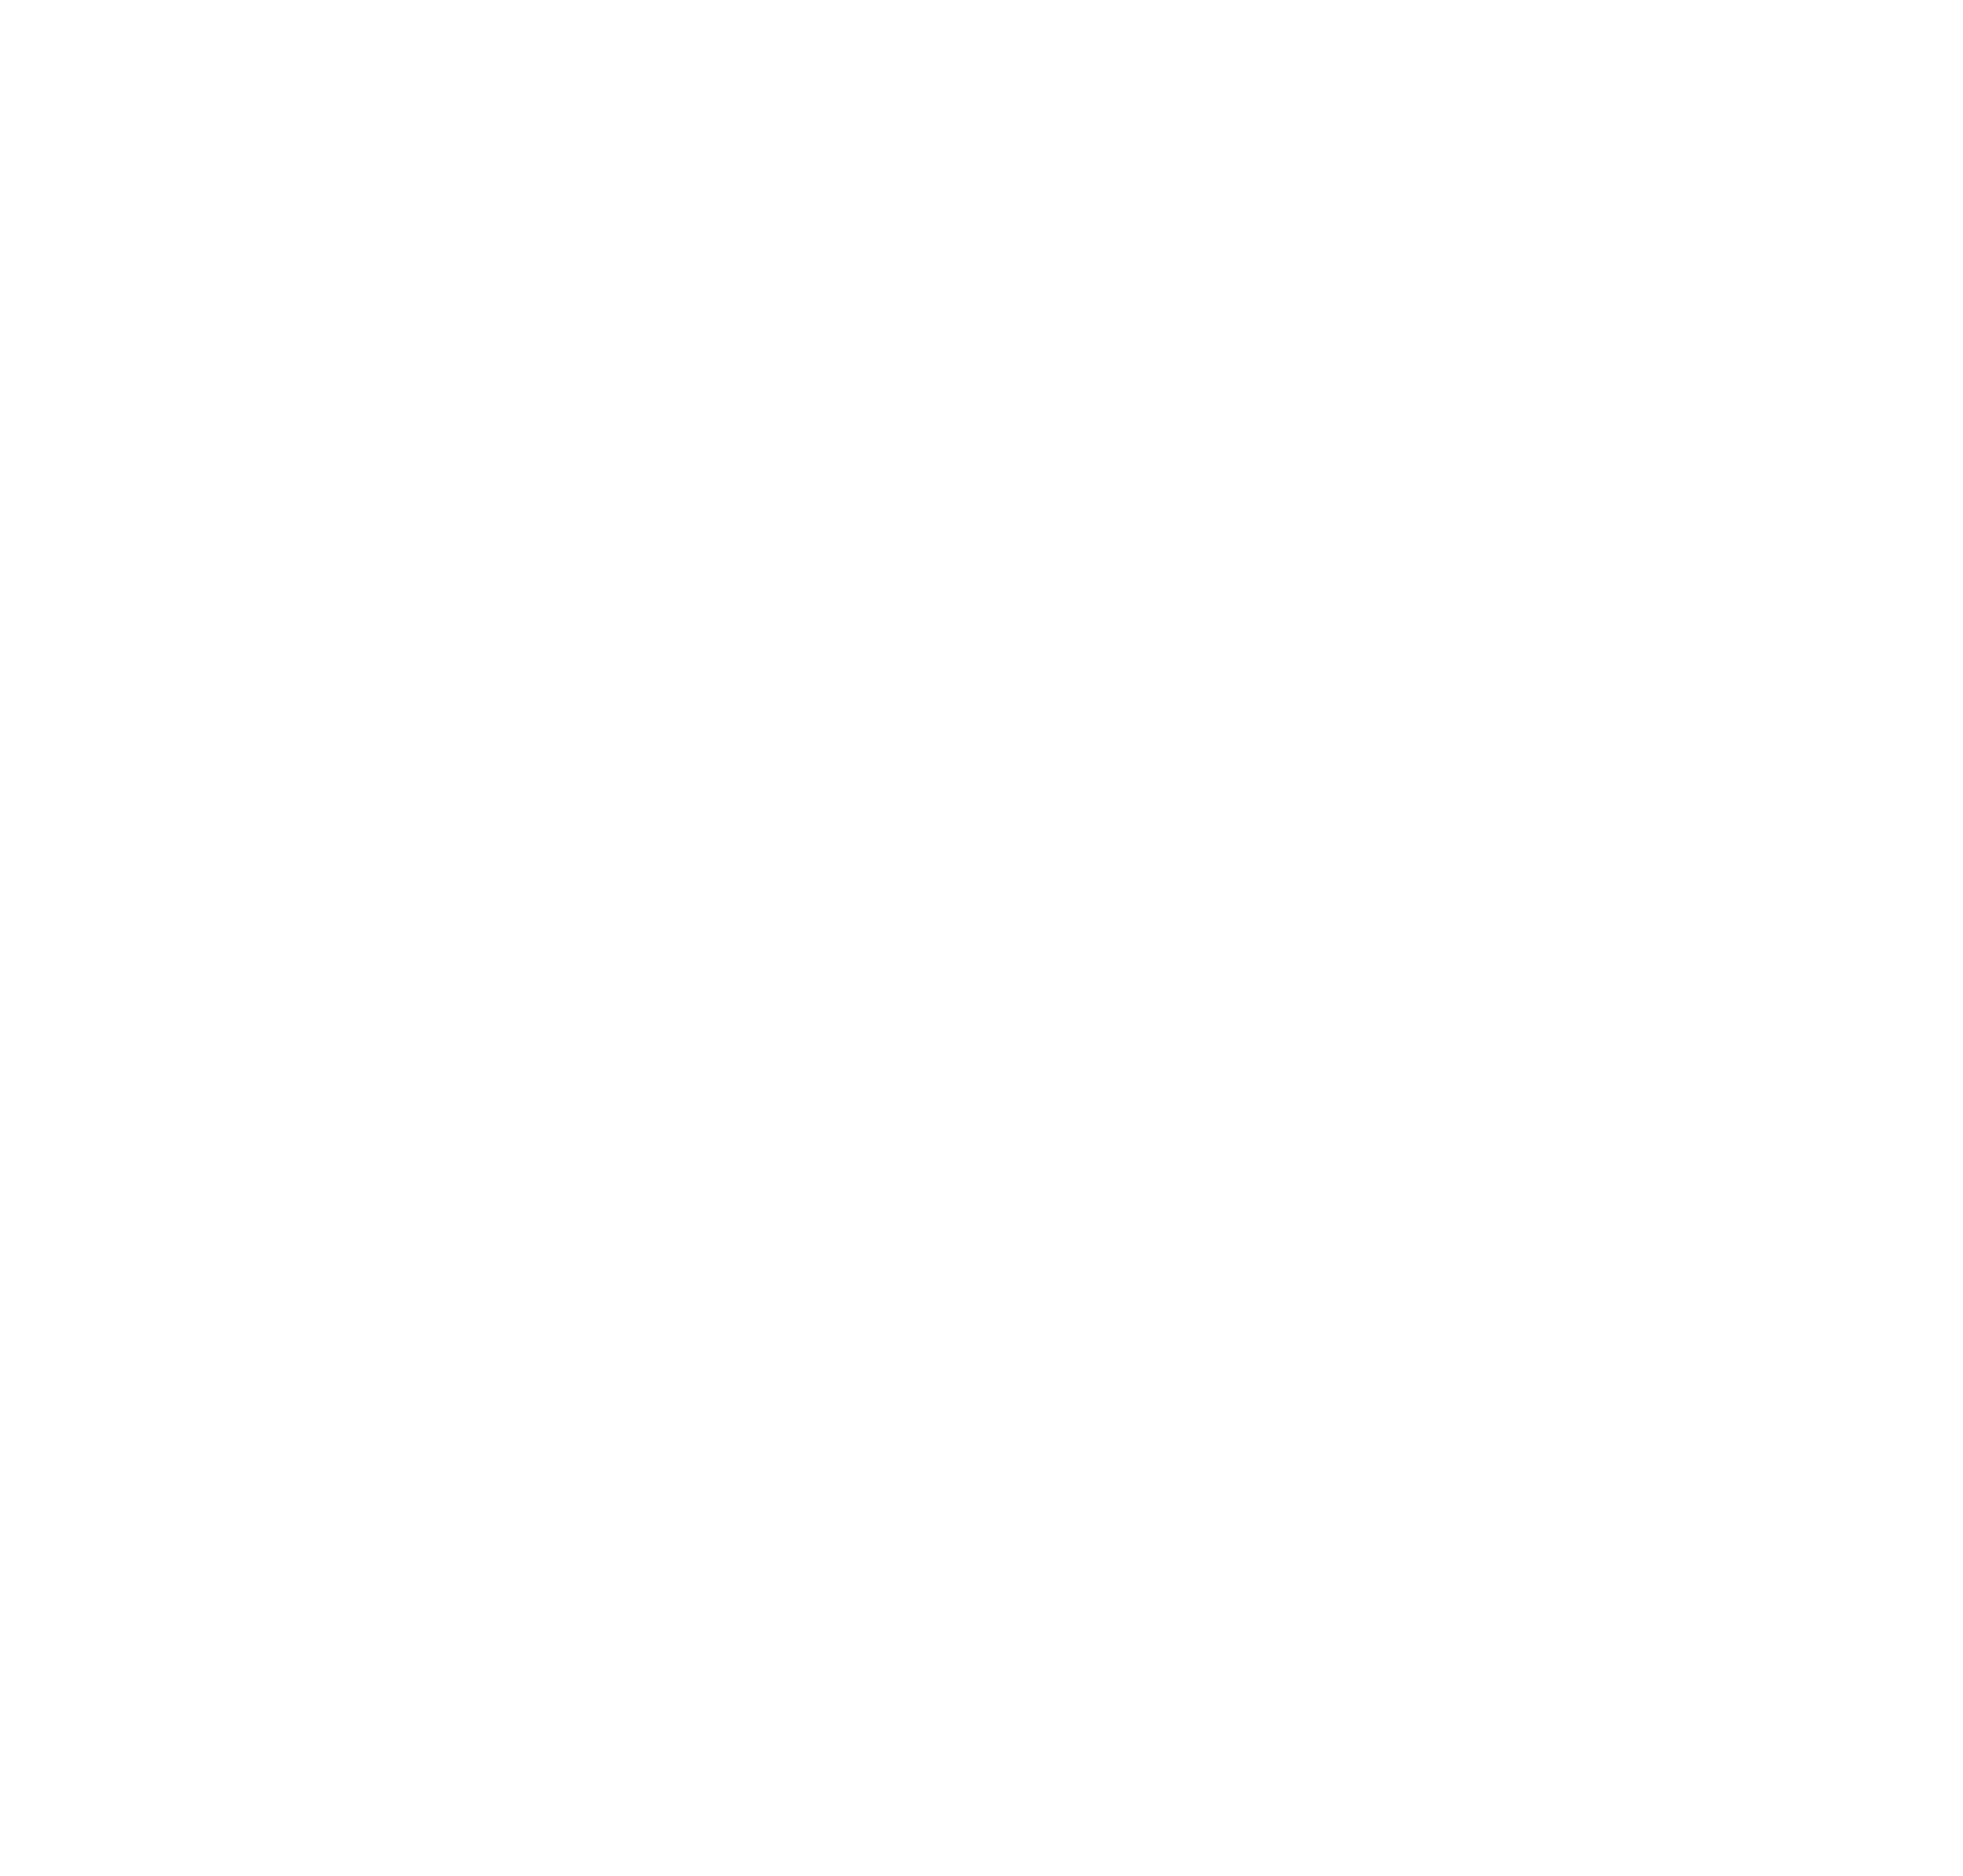 PIMAN Groupe